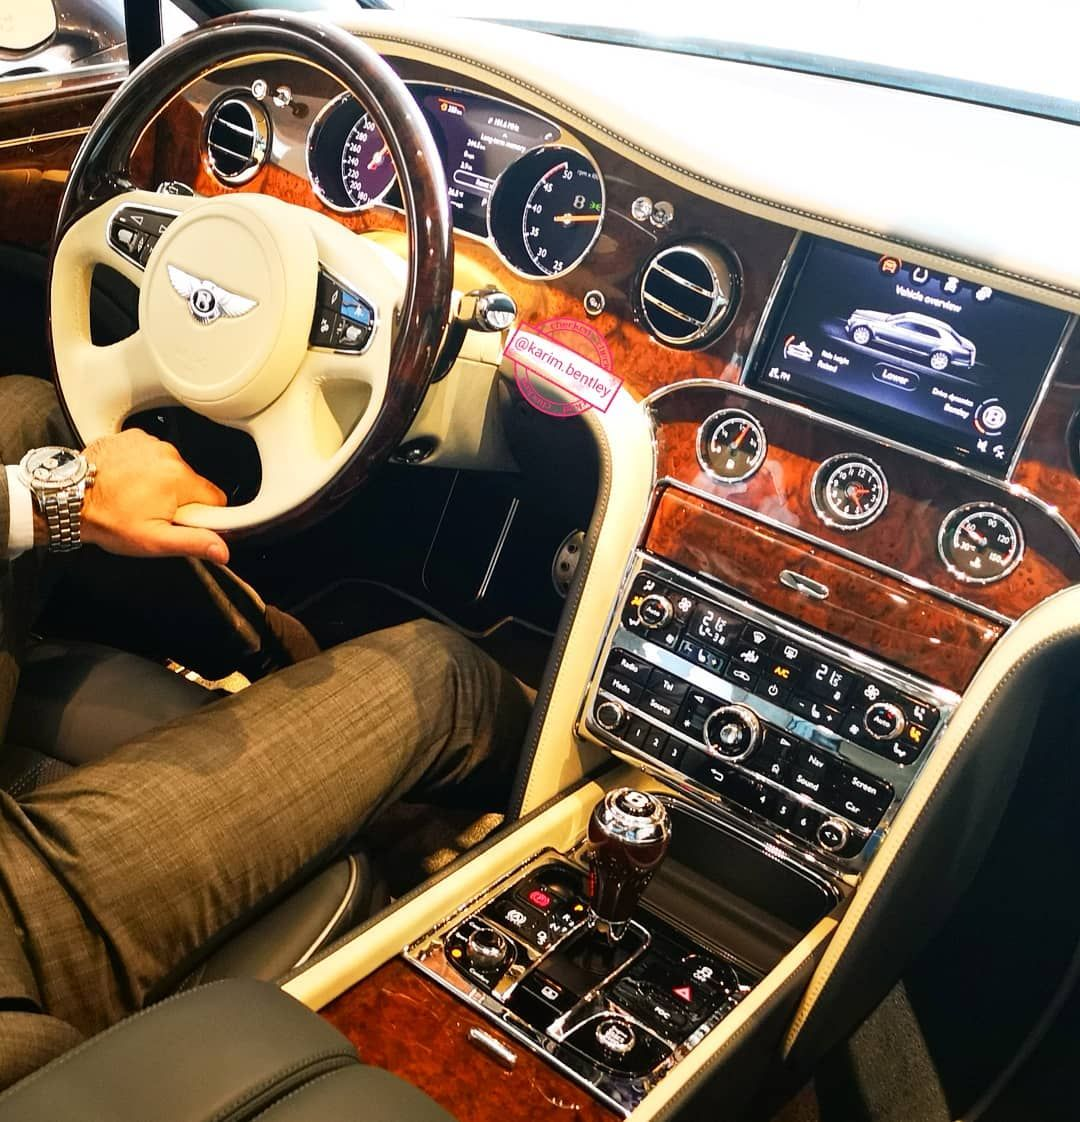 Bentley Interior Luxury Car: #bentley #mulsanne #bentleymulsanne #uae #karimhaddad